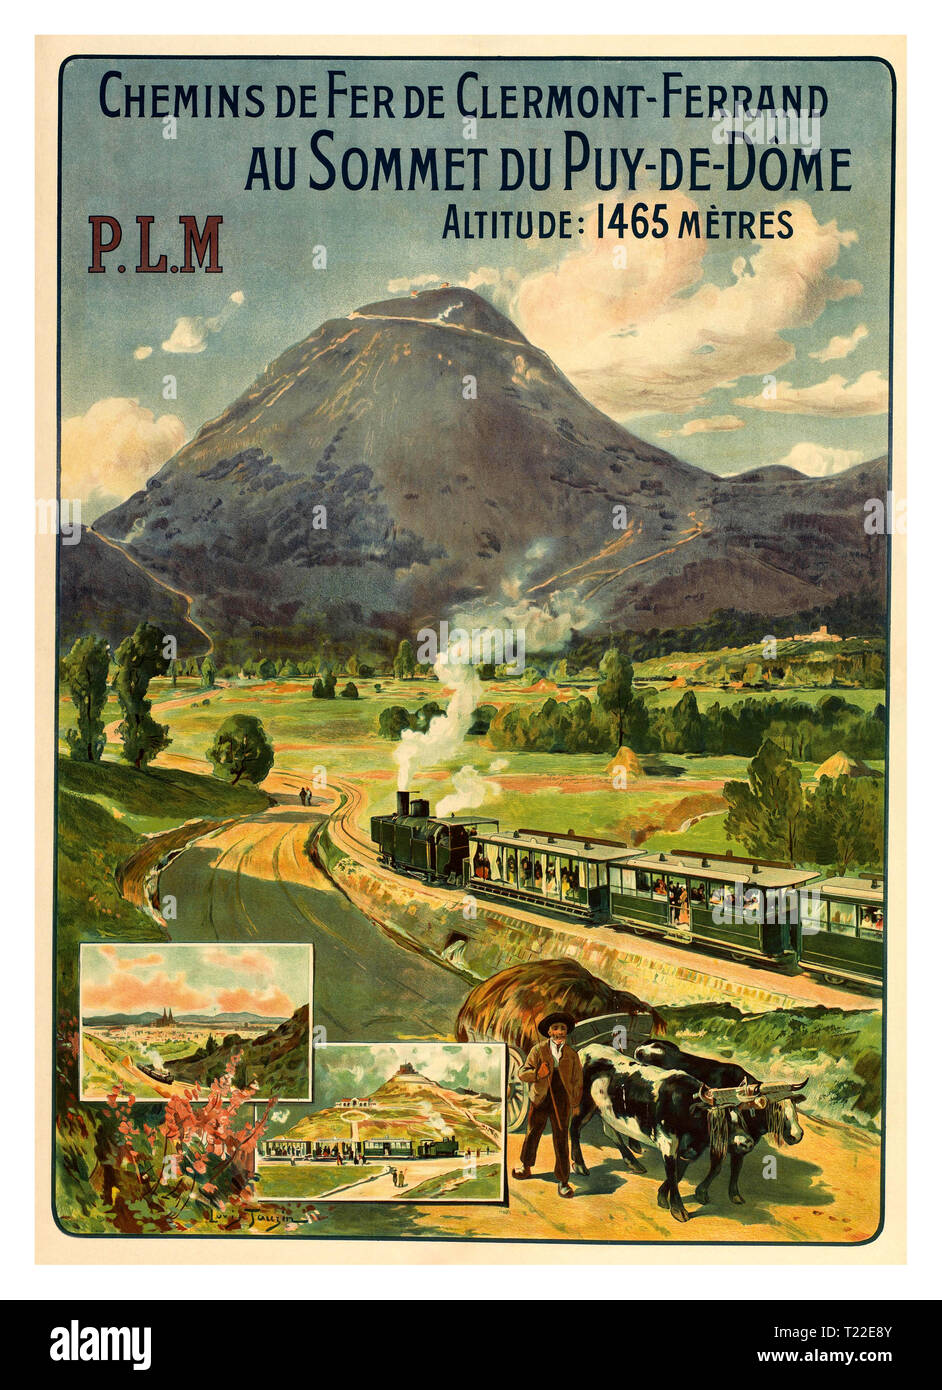 Vintage Rail Travel Poster for the PLM company, the first to operate the Puy-de-Dôme train that ran from 1907 to 1926. Chemins de Fer de Clermont-Ferrand au Sommet du Puy-de-Dôme France Date 1907-1915 by Artist Louis Tauzin - Stock Image